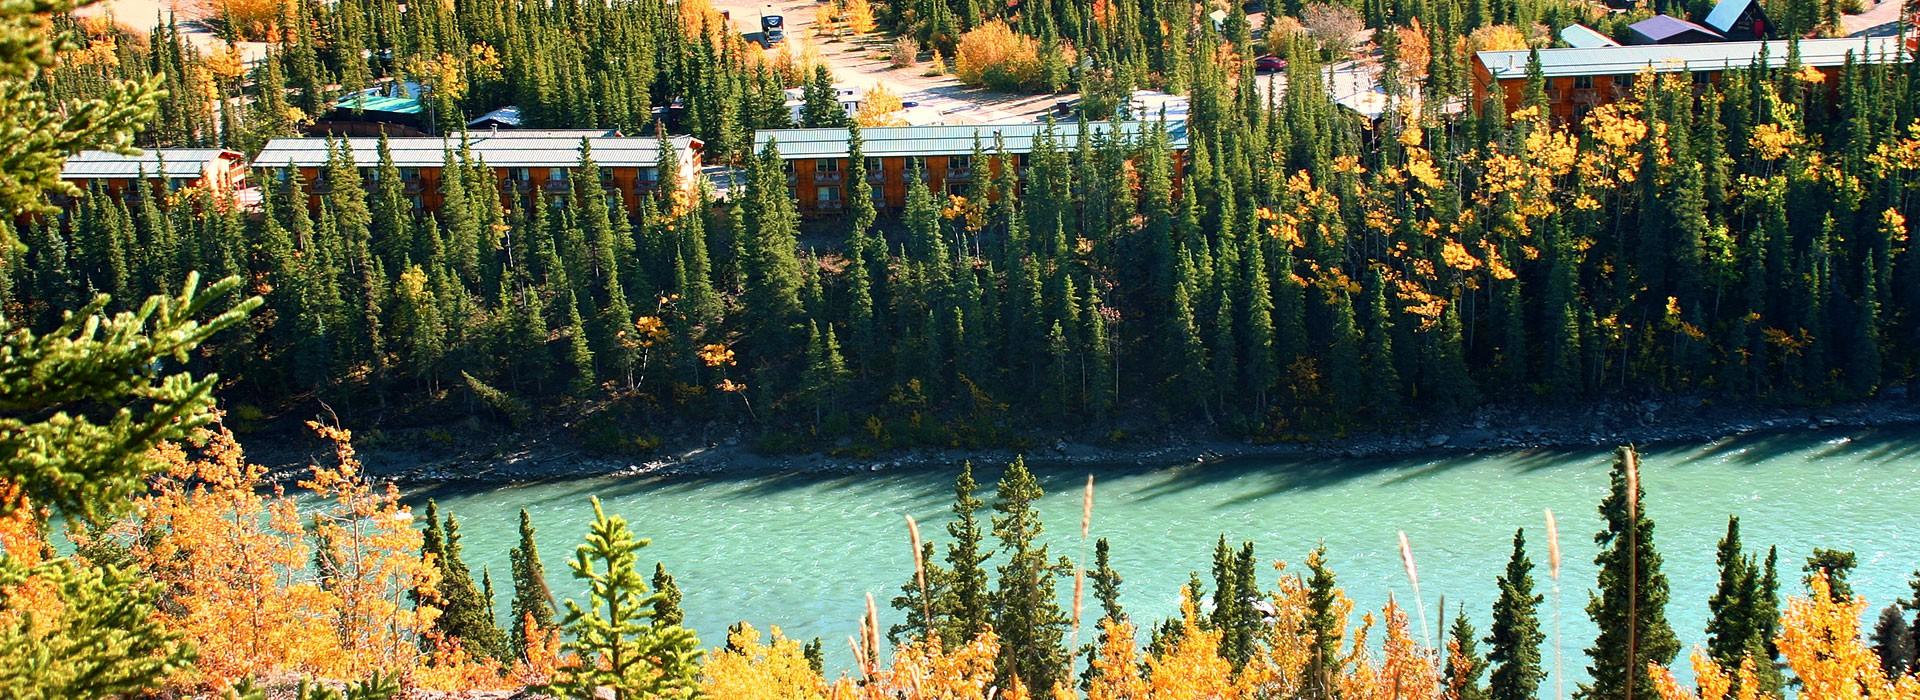 Incroyable Denali National Park Resort U0026 Lodging In Alaska | Denali Grizzly ...